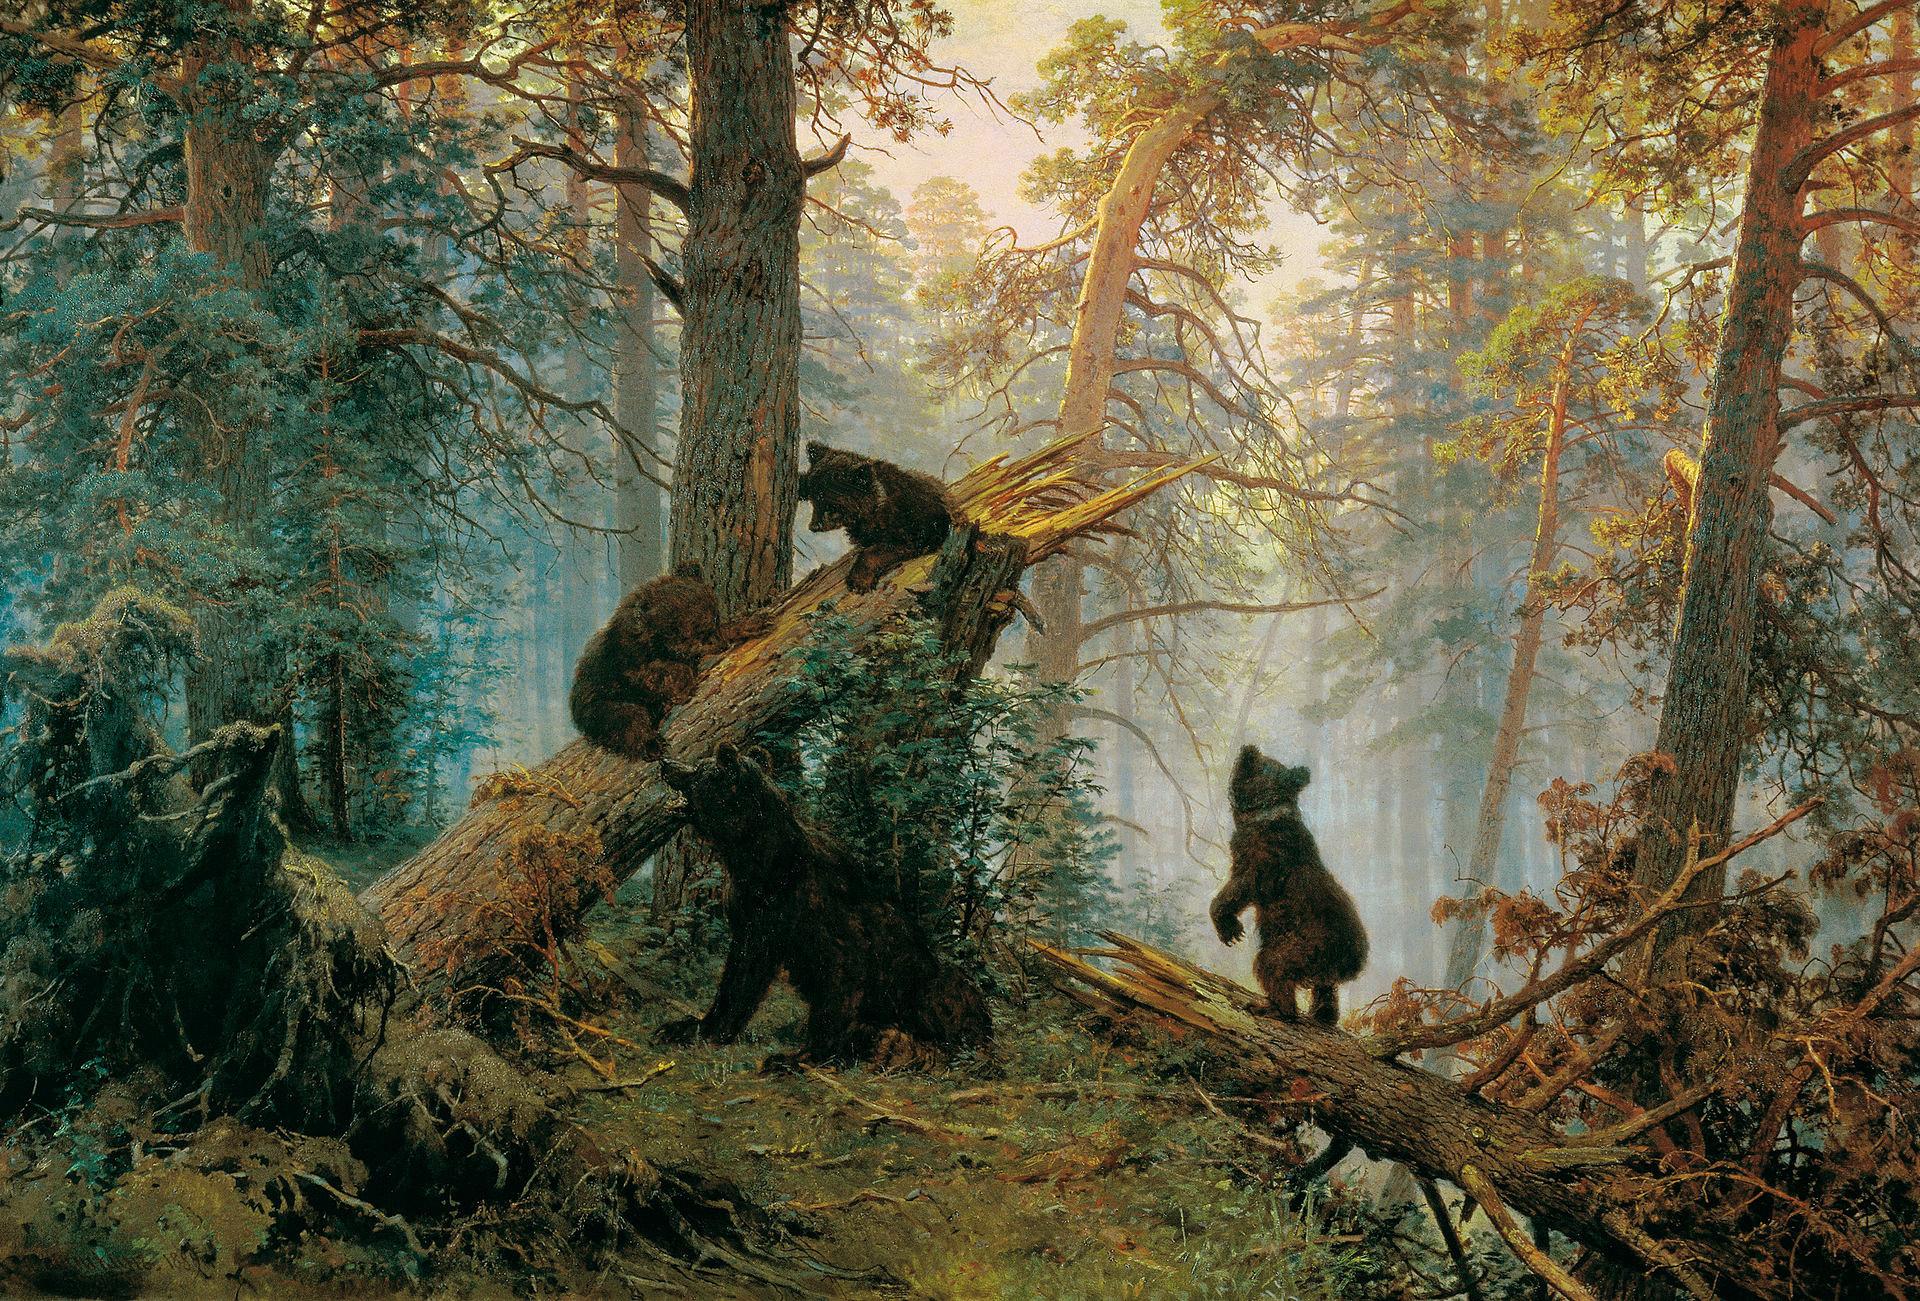 """Mañana en un bosque de pinos"" , obra de Iván Shishkin y Konstantín Savitski."